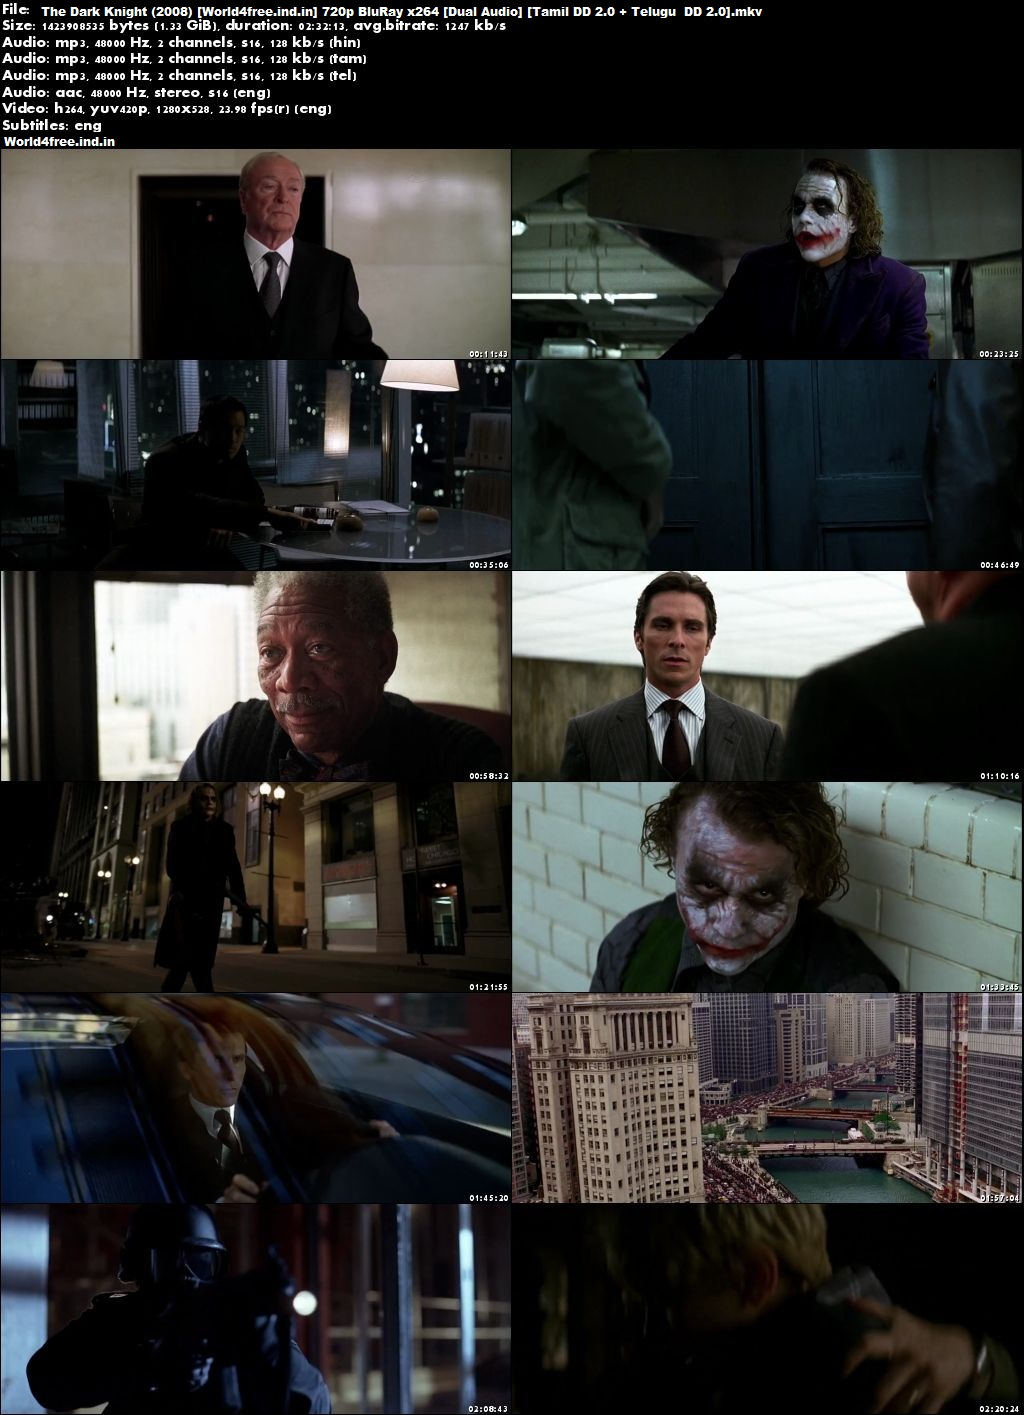 The Dark Knight 2008 world4free.ind.in Dual Audio BRRip 720p Tamil Telugu